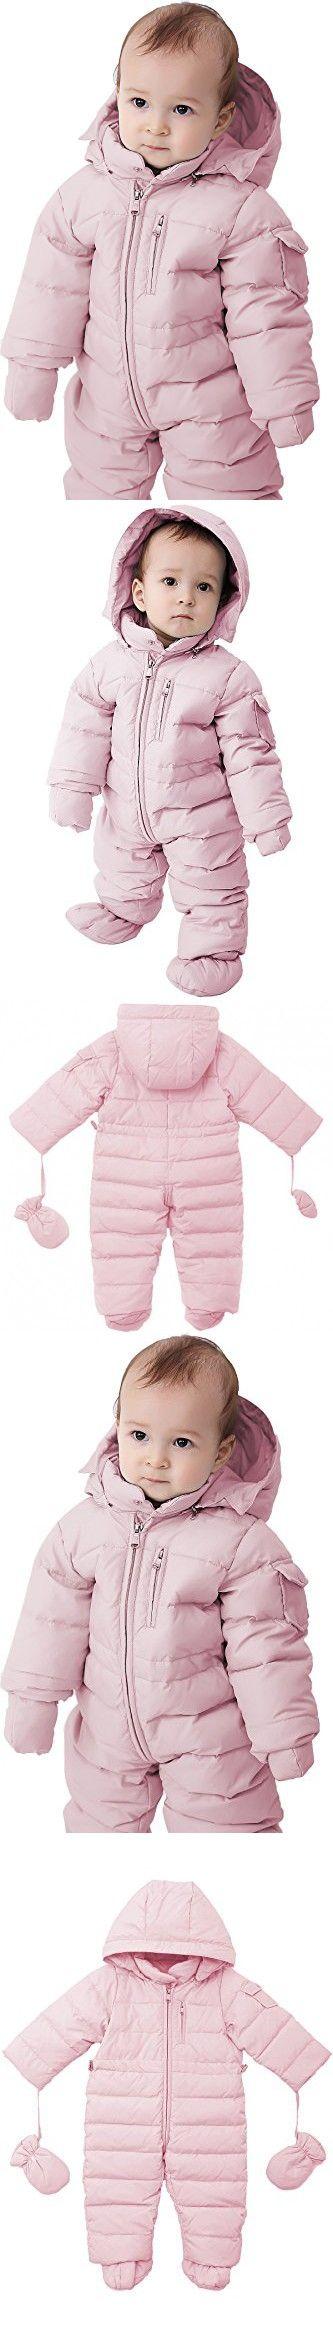 Oceankids Baby Boys Girls Pink Pram One-Piece Snowsuit Attached Hood 9M 6-9 Months